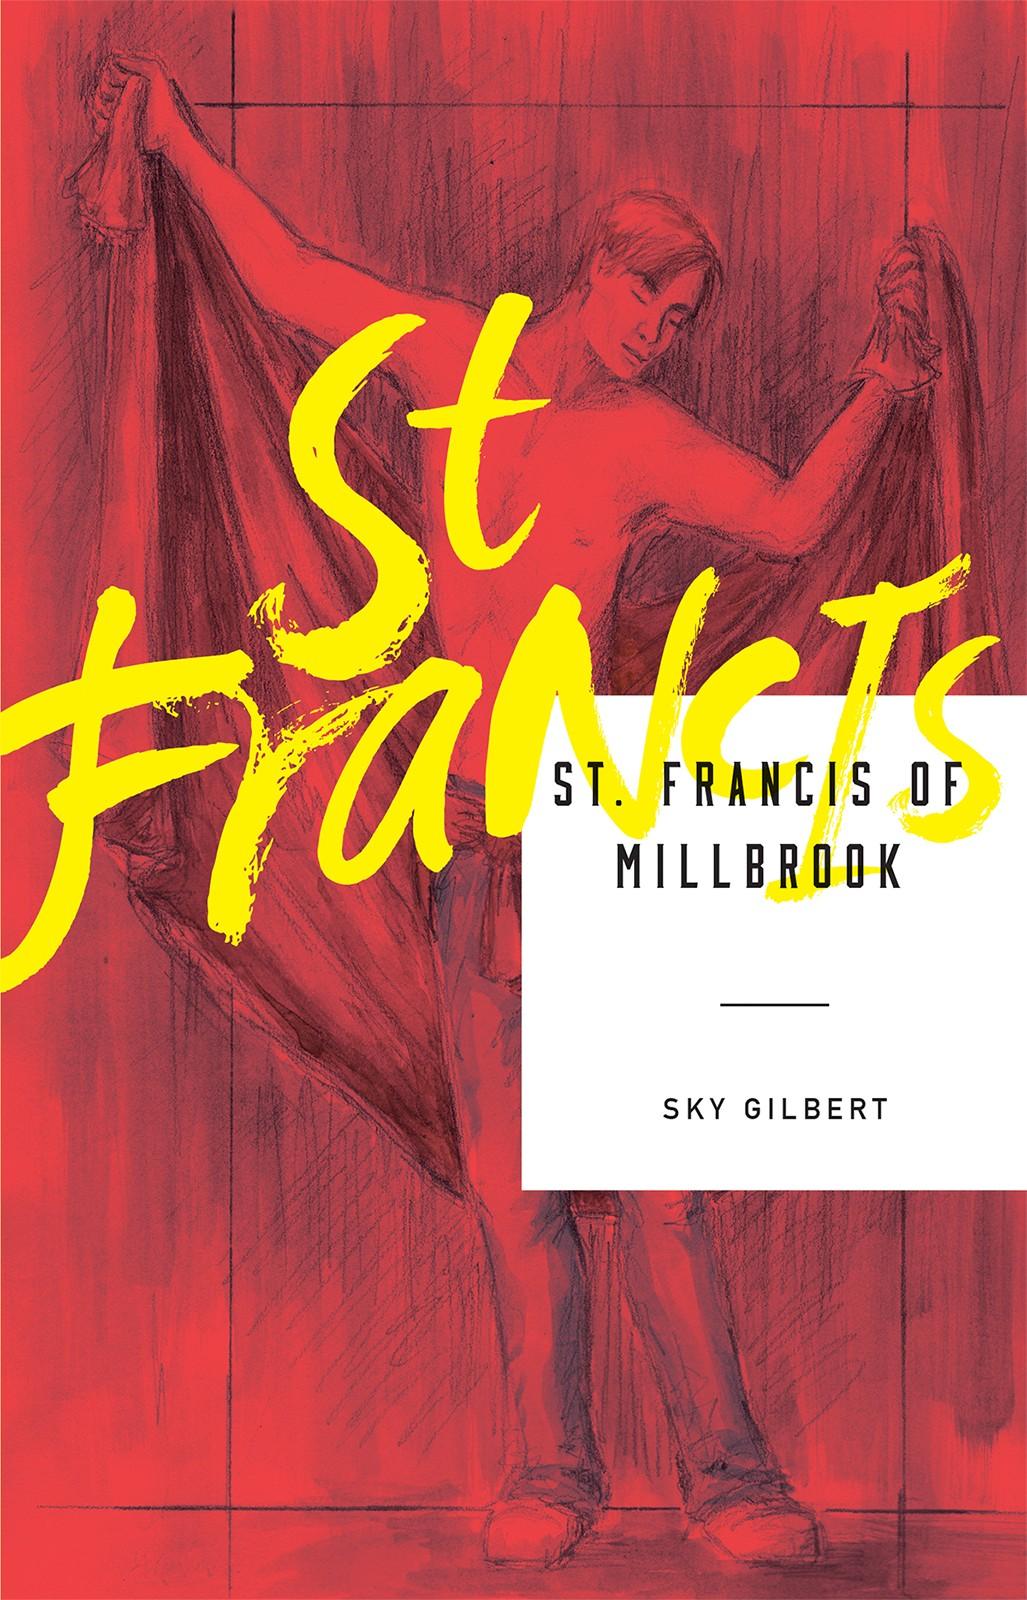 St. Francis of Millbrook (print)